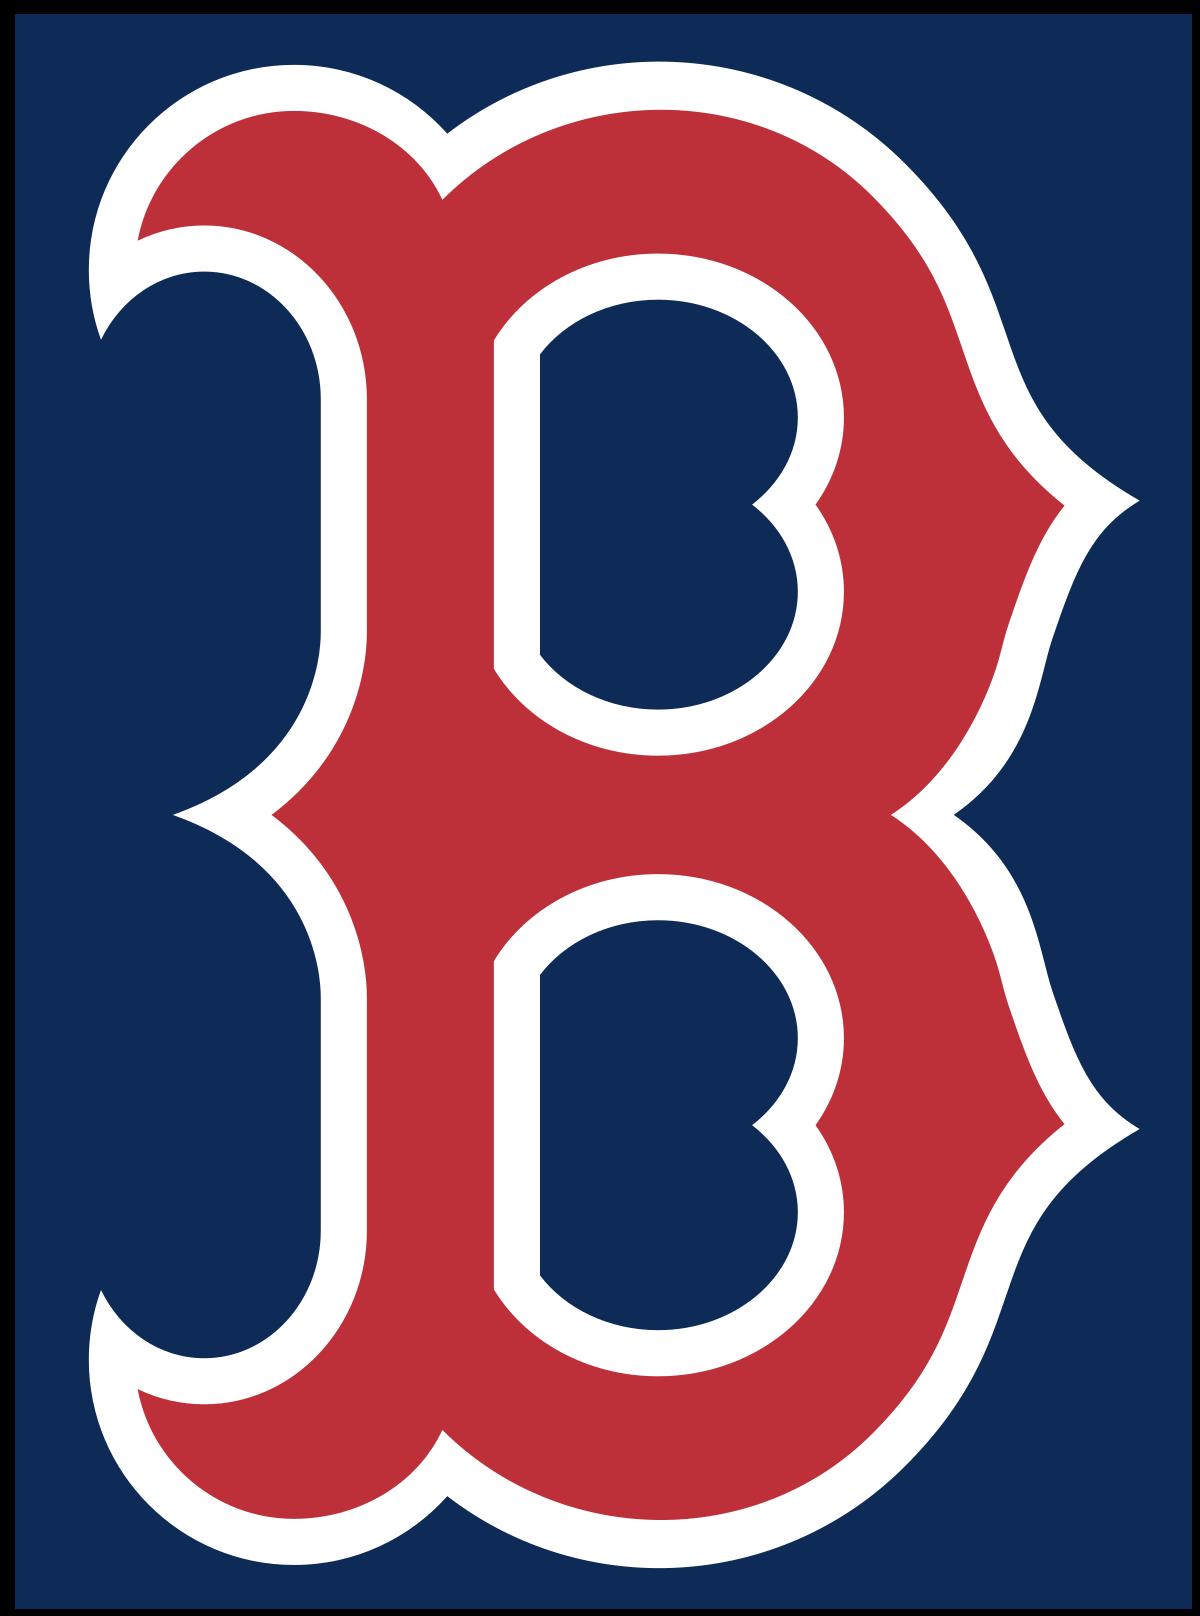 2018 Boston Red Sox season.